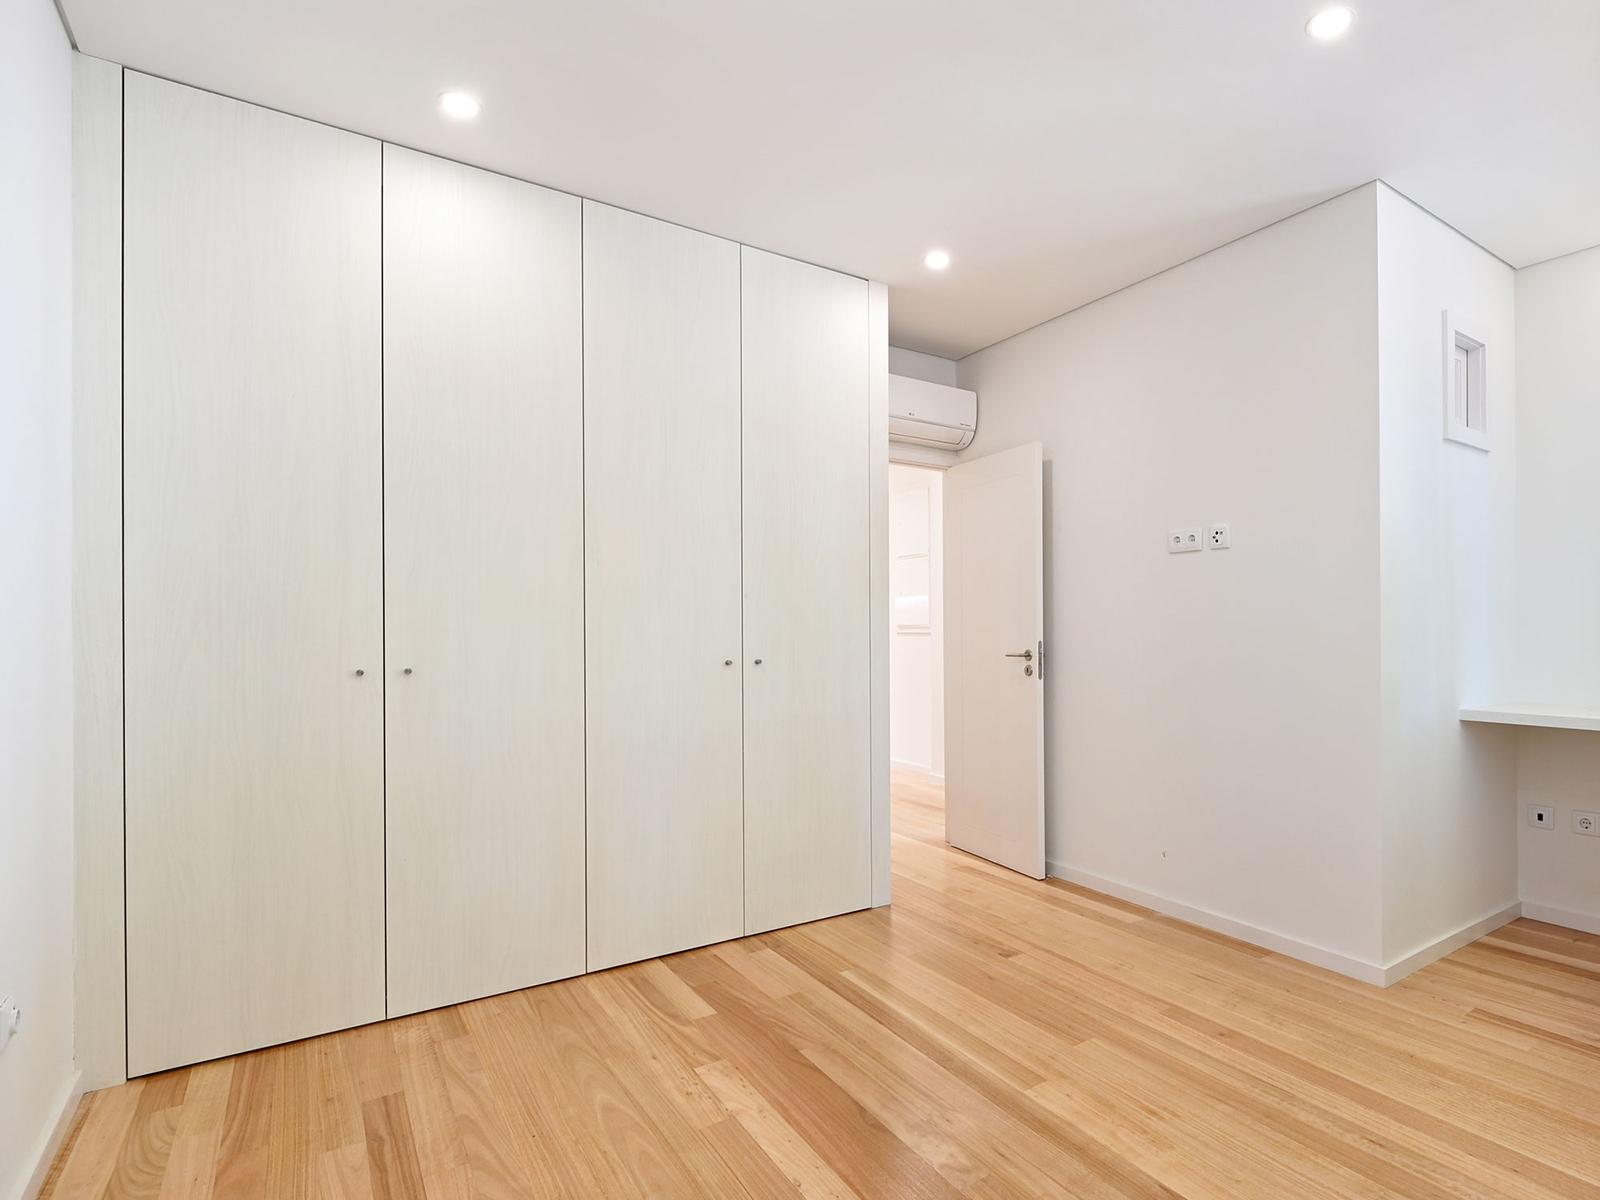 New Apartment in Arca d'Água – 96.52 m²